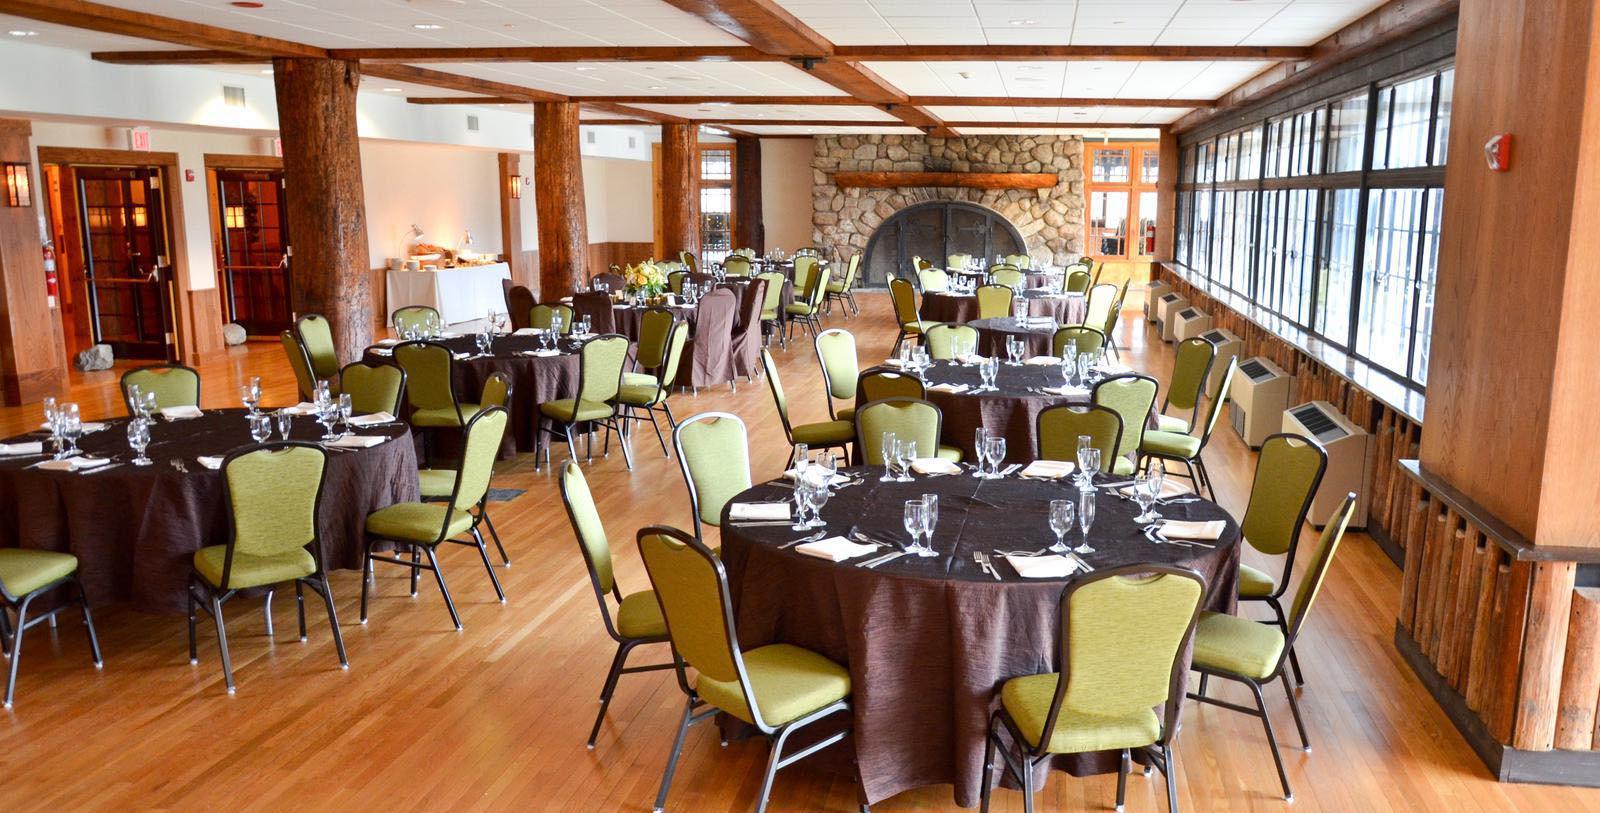 Image of Dining Room in Blue Roof Bar Restaurant at Bear Mountain Inn, 1915, Member of Historic Hotels of America, in Bear Mountain, New York, Taste